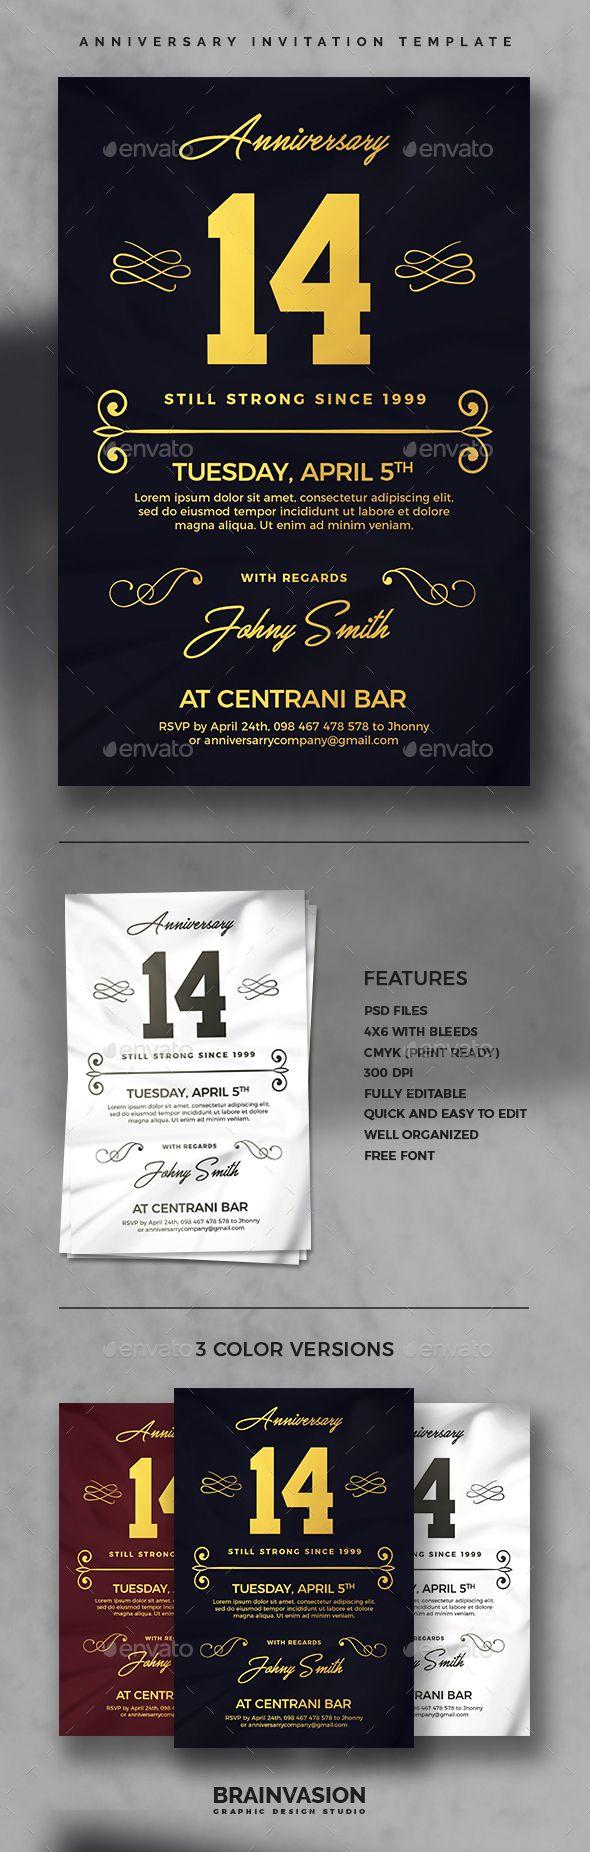 Anniversary Invitation Template Vol02 122 best Anniversary